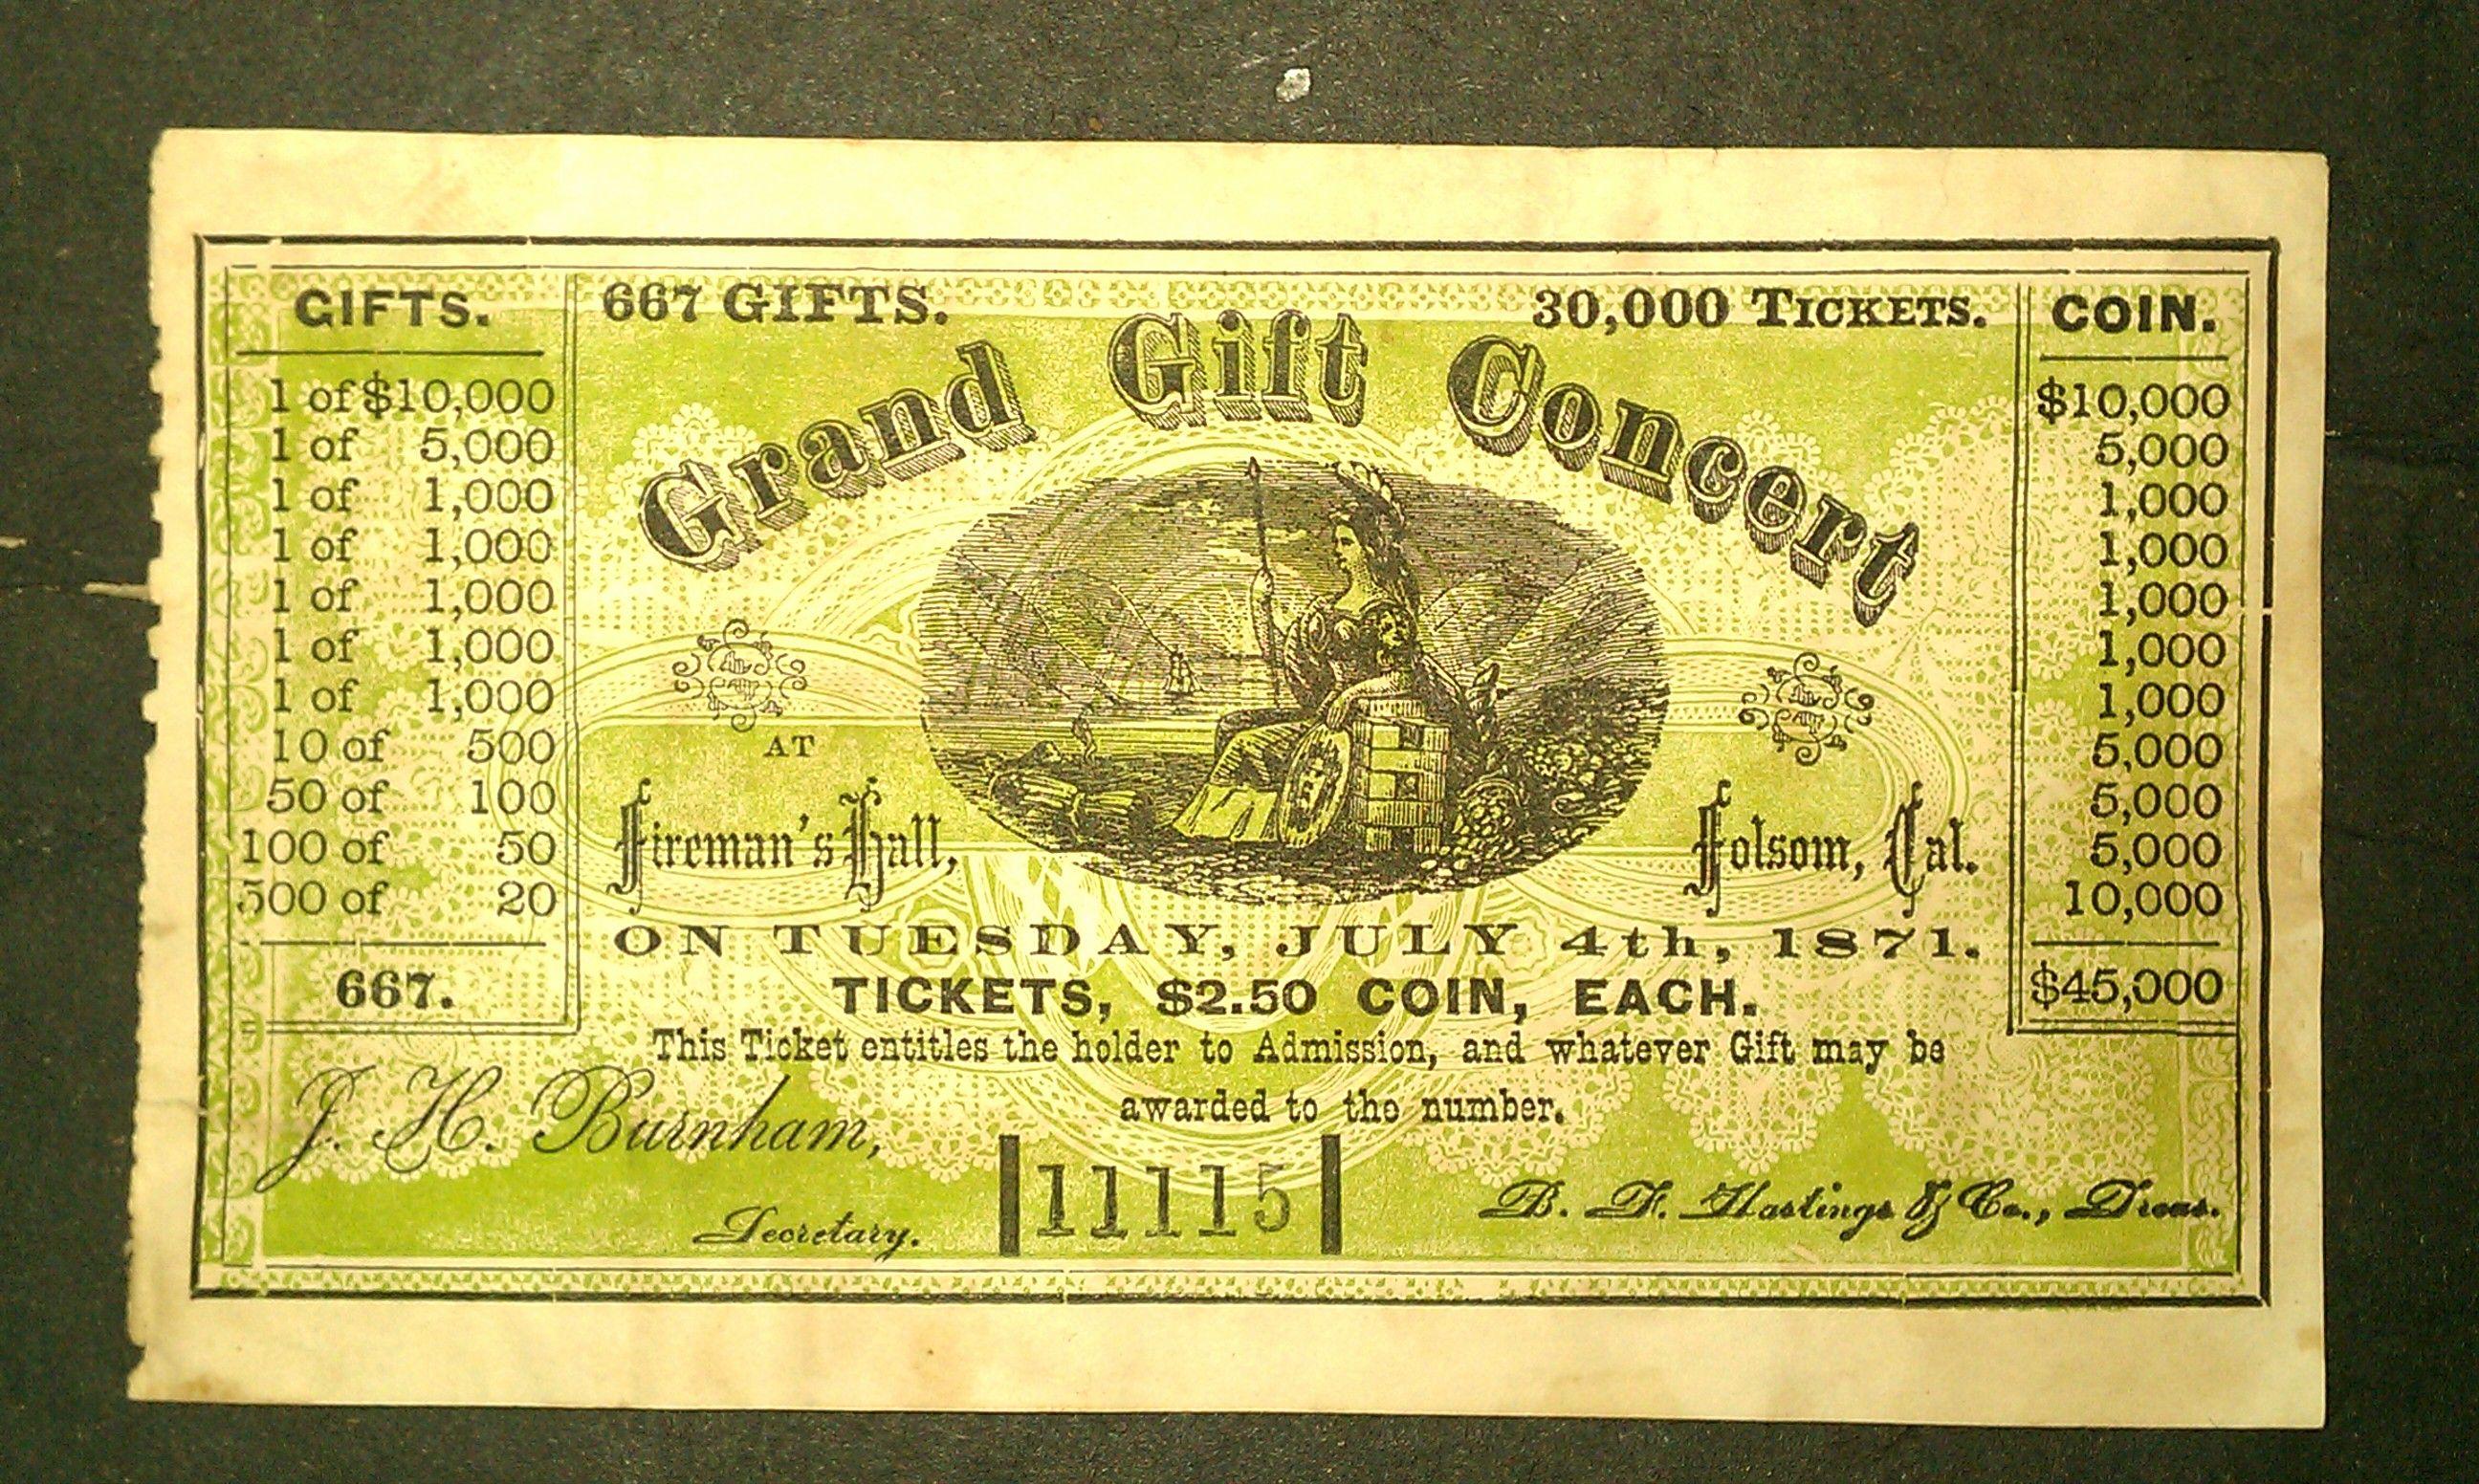 Folsom California Firemans Hall Grand Gift Concert Burnham Ticket   3 1/2 x 6 inch July 4 1871 ticket fund raiser held at fireman's Hall Folsom california. treasurer B.F. Hastings, paper adherance at back of ticket.   id #740  $250